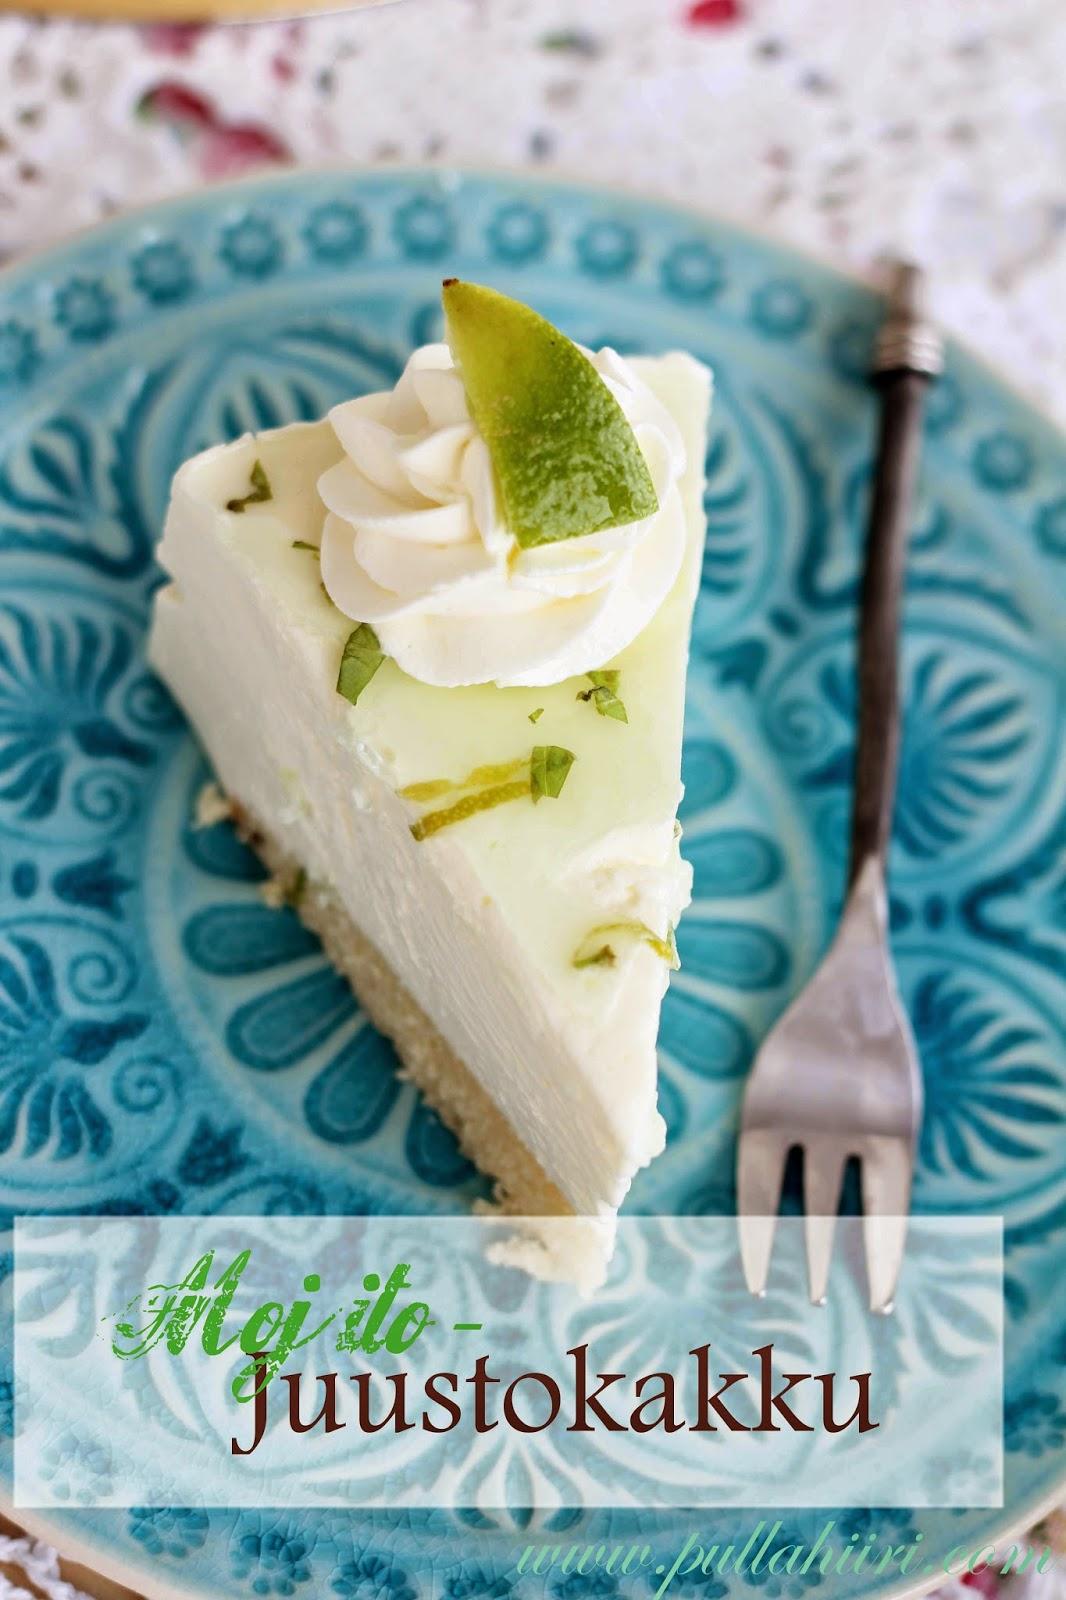 http://www.pullahiiri.com/2014/08/mojito-juustokakku-mojito-cheesecake.html